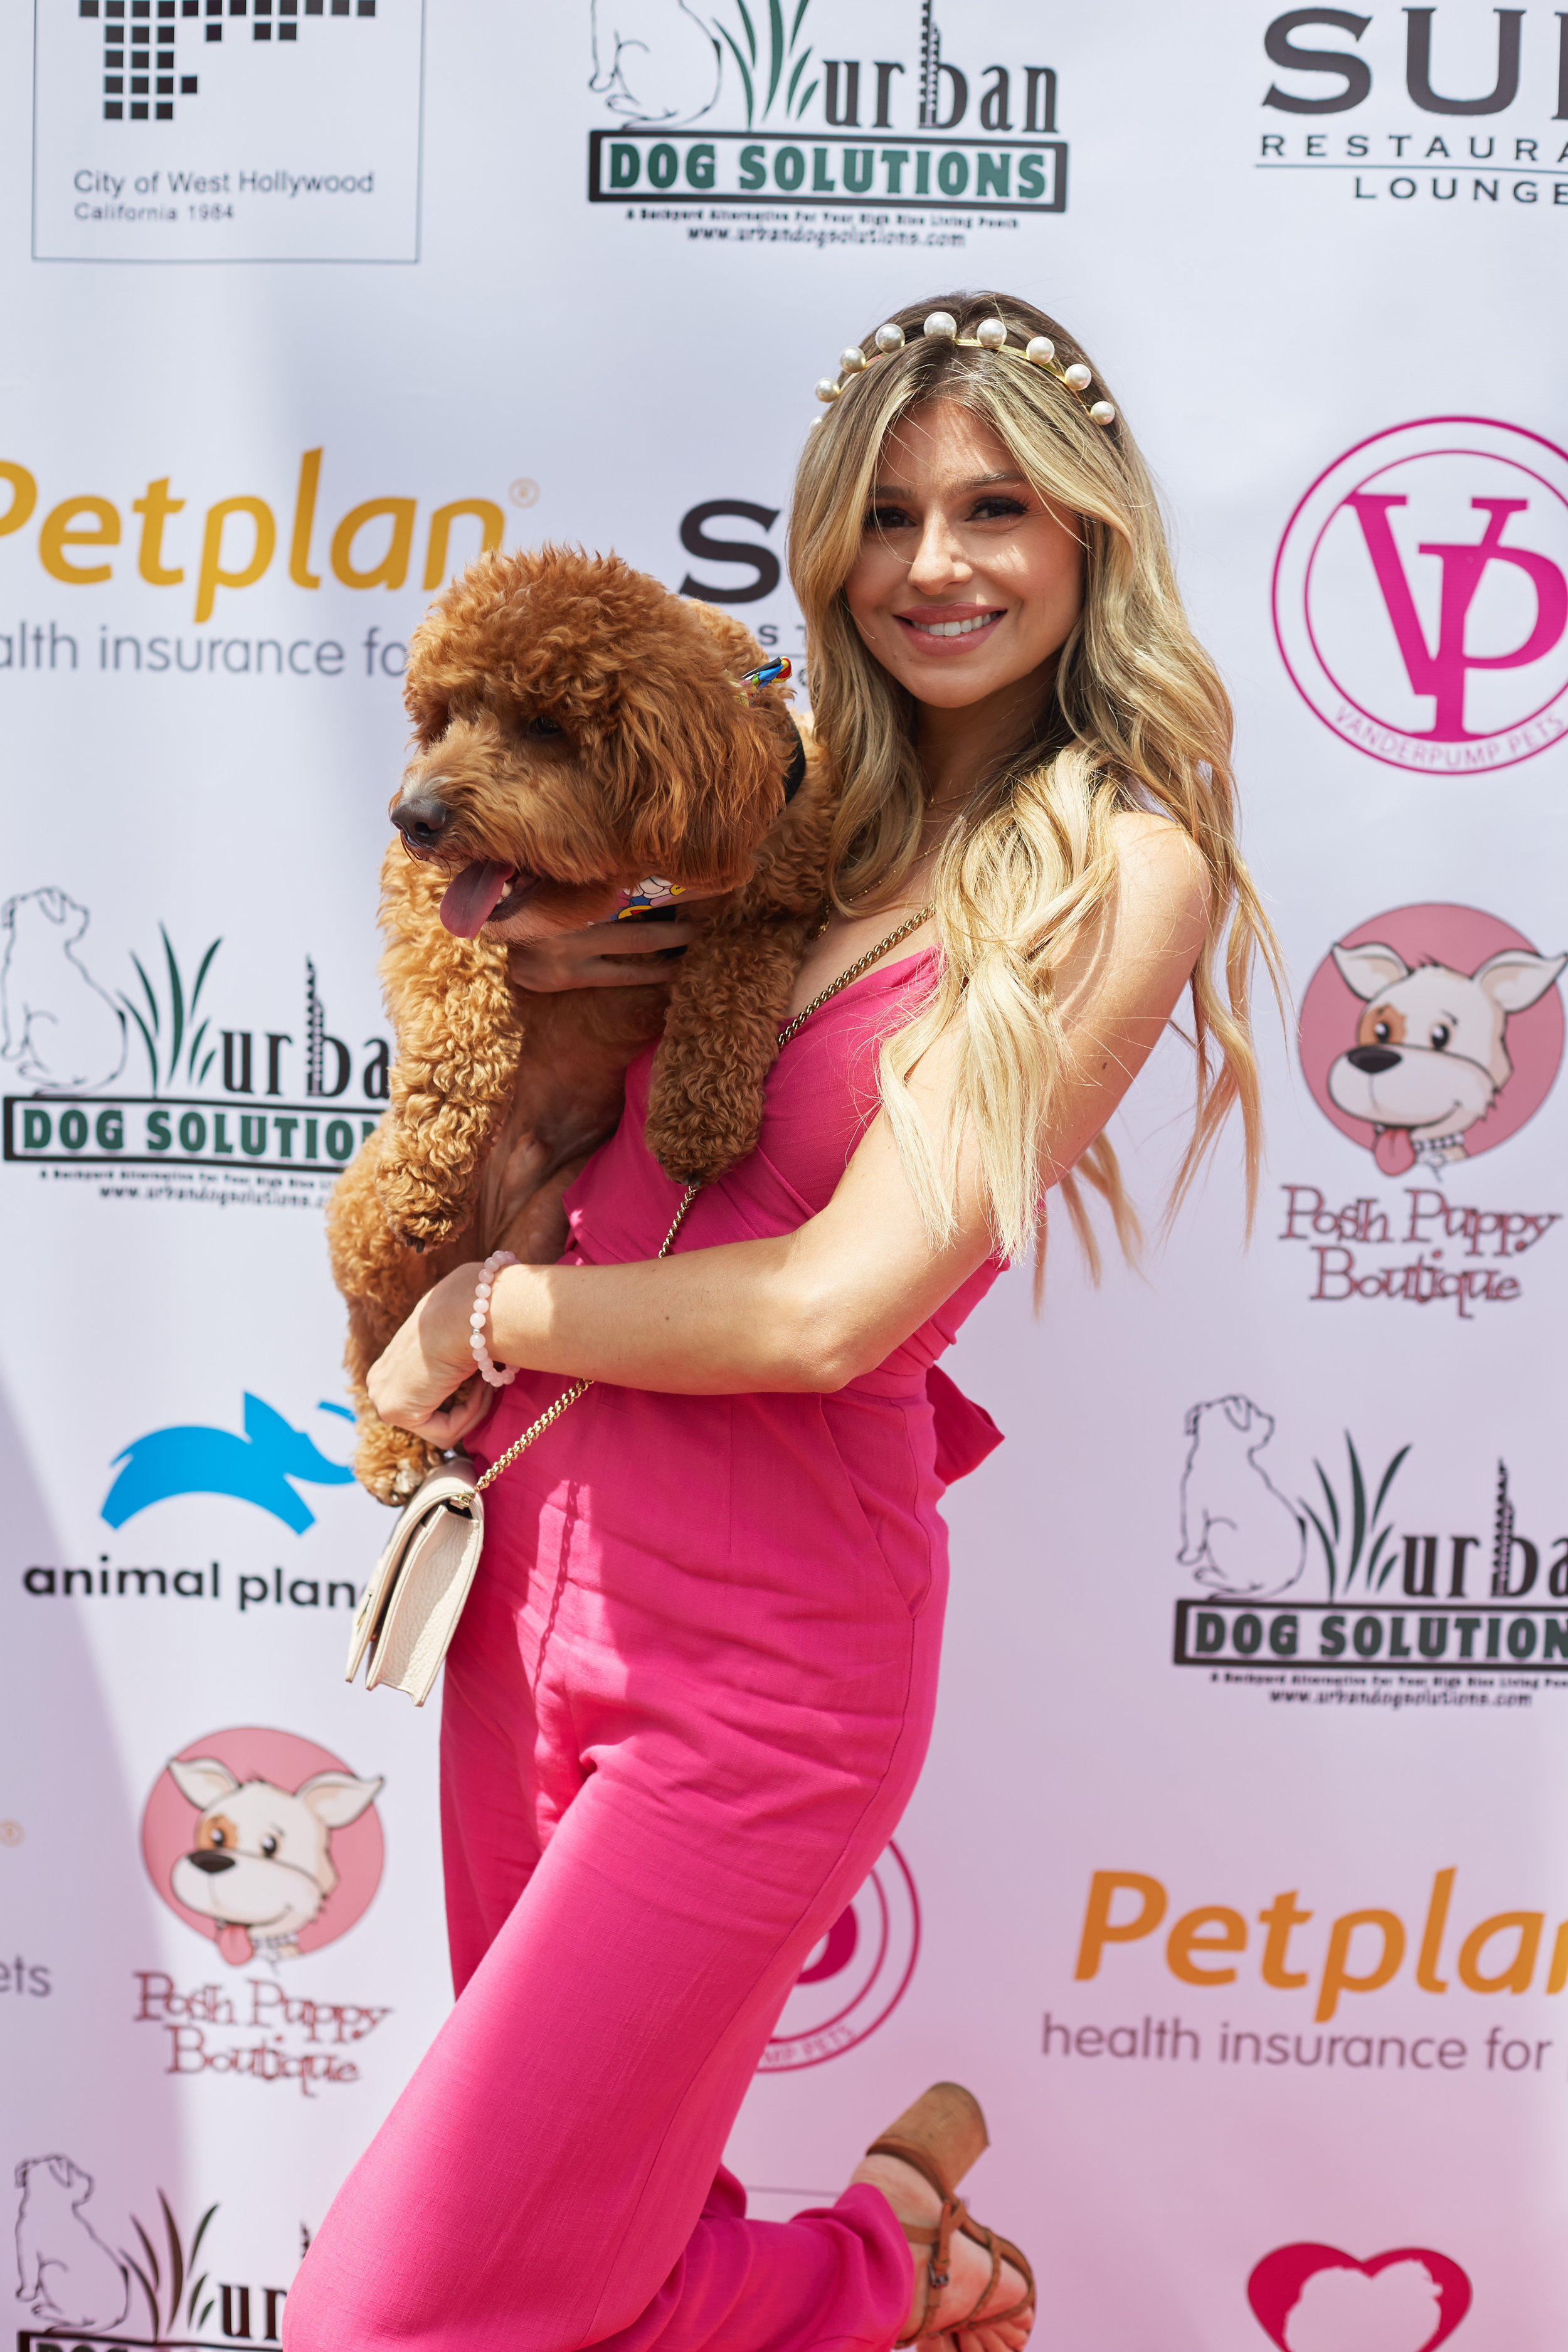 World Dog Day 2019 Gallery — The Vanderpump Dog Foundation